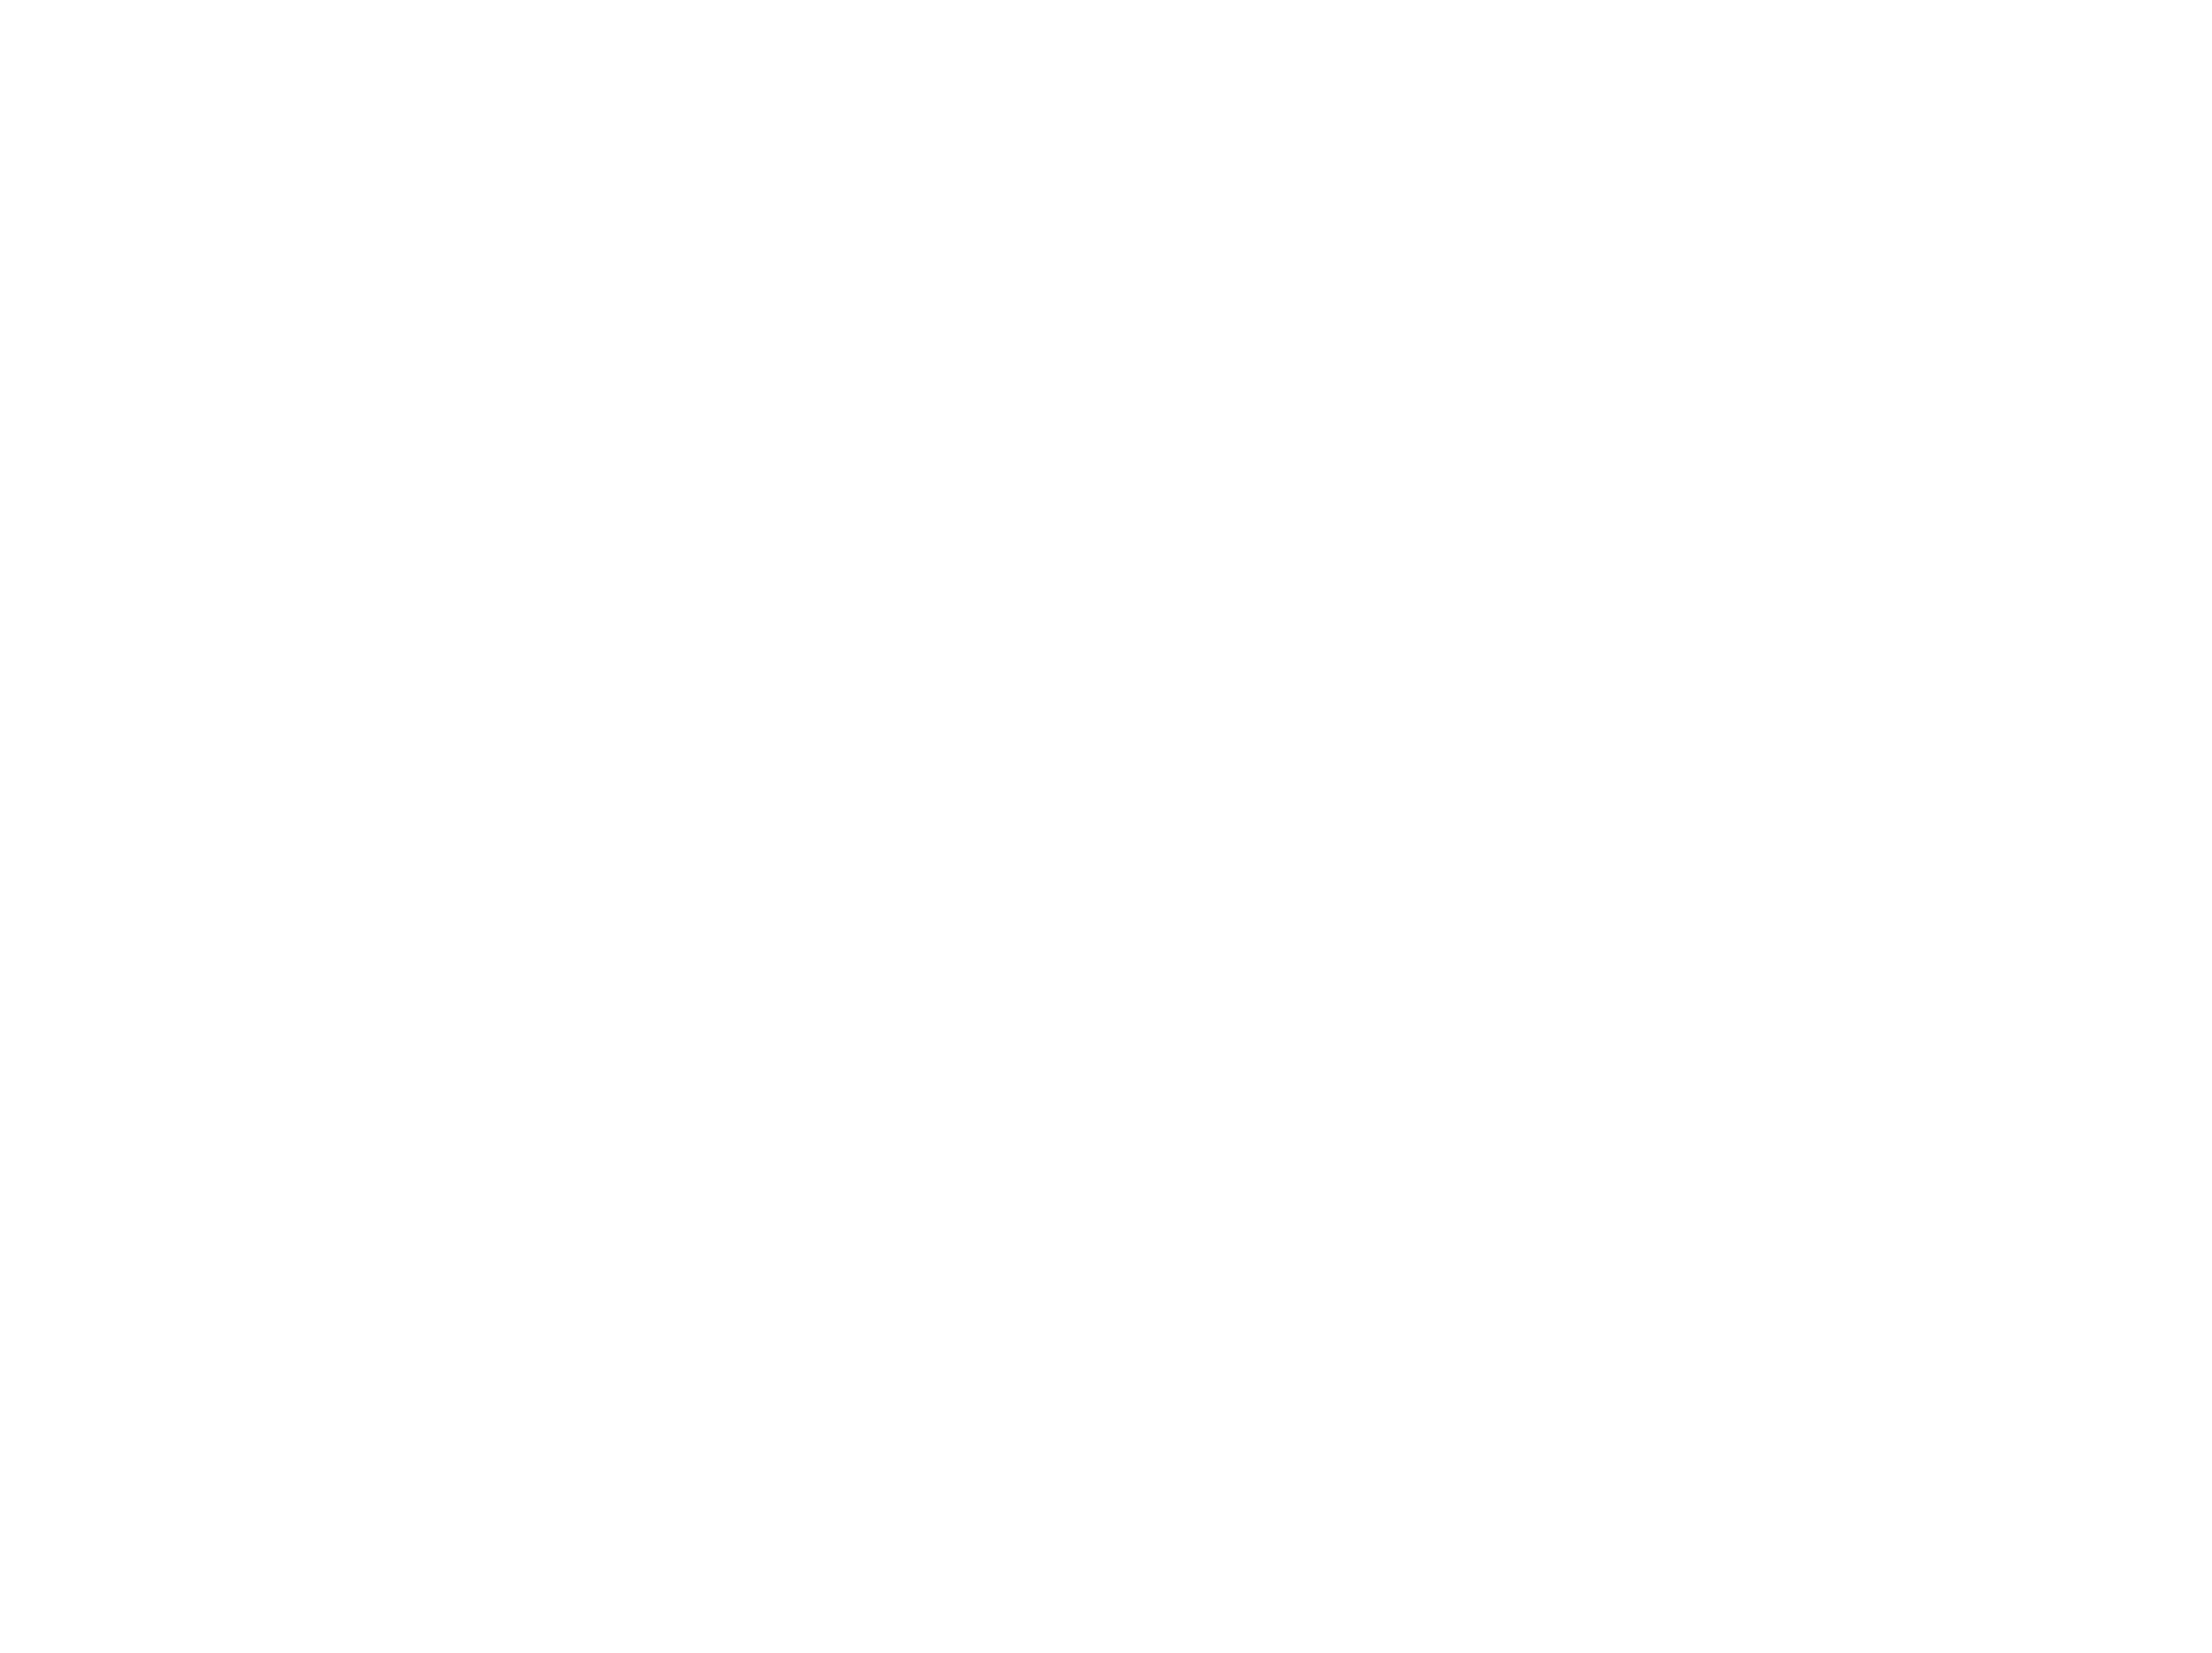 MOS en MOK